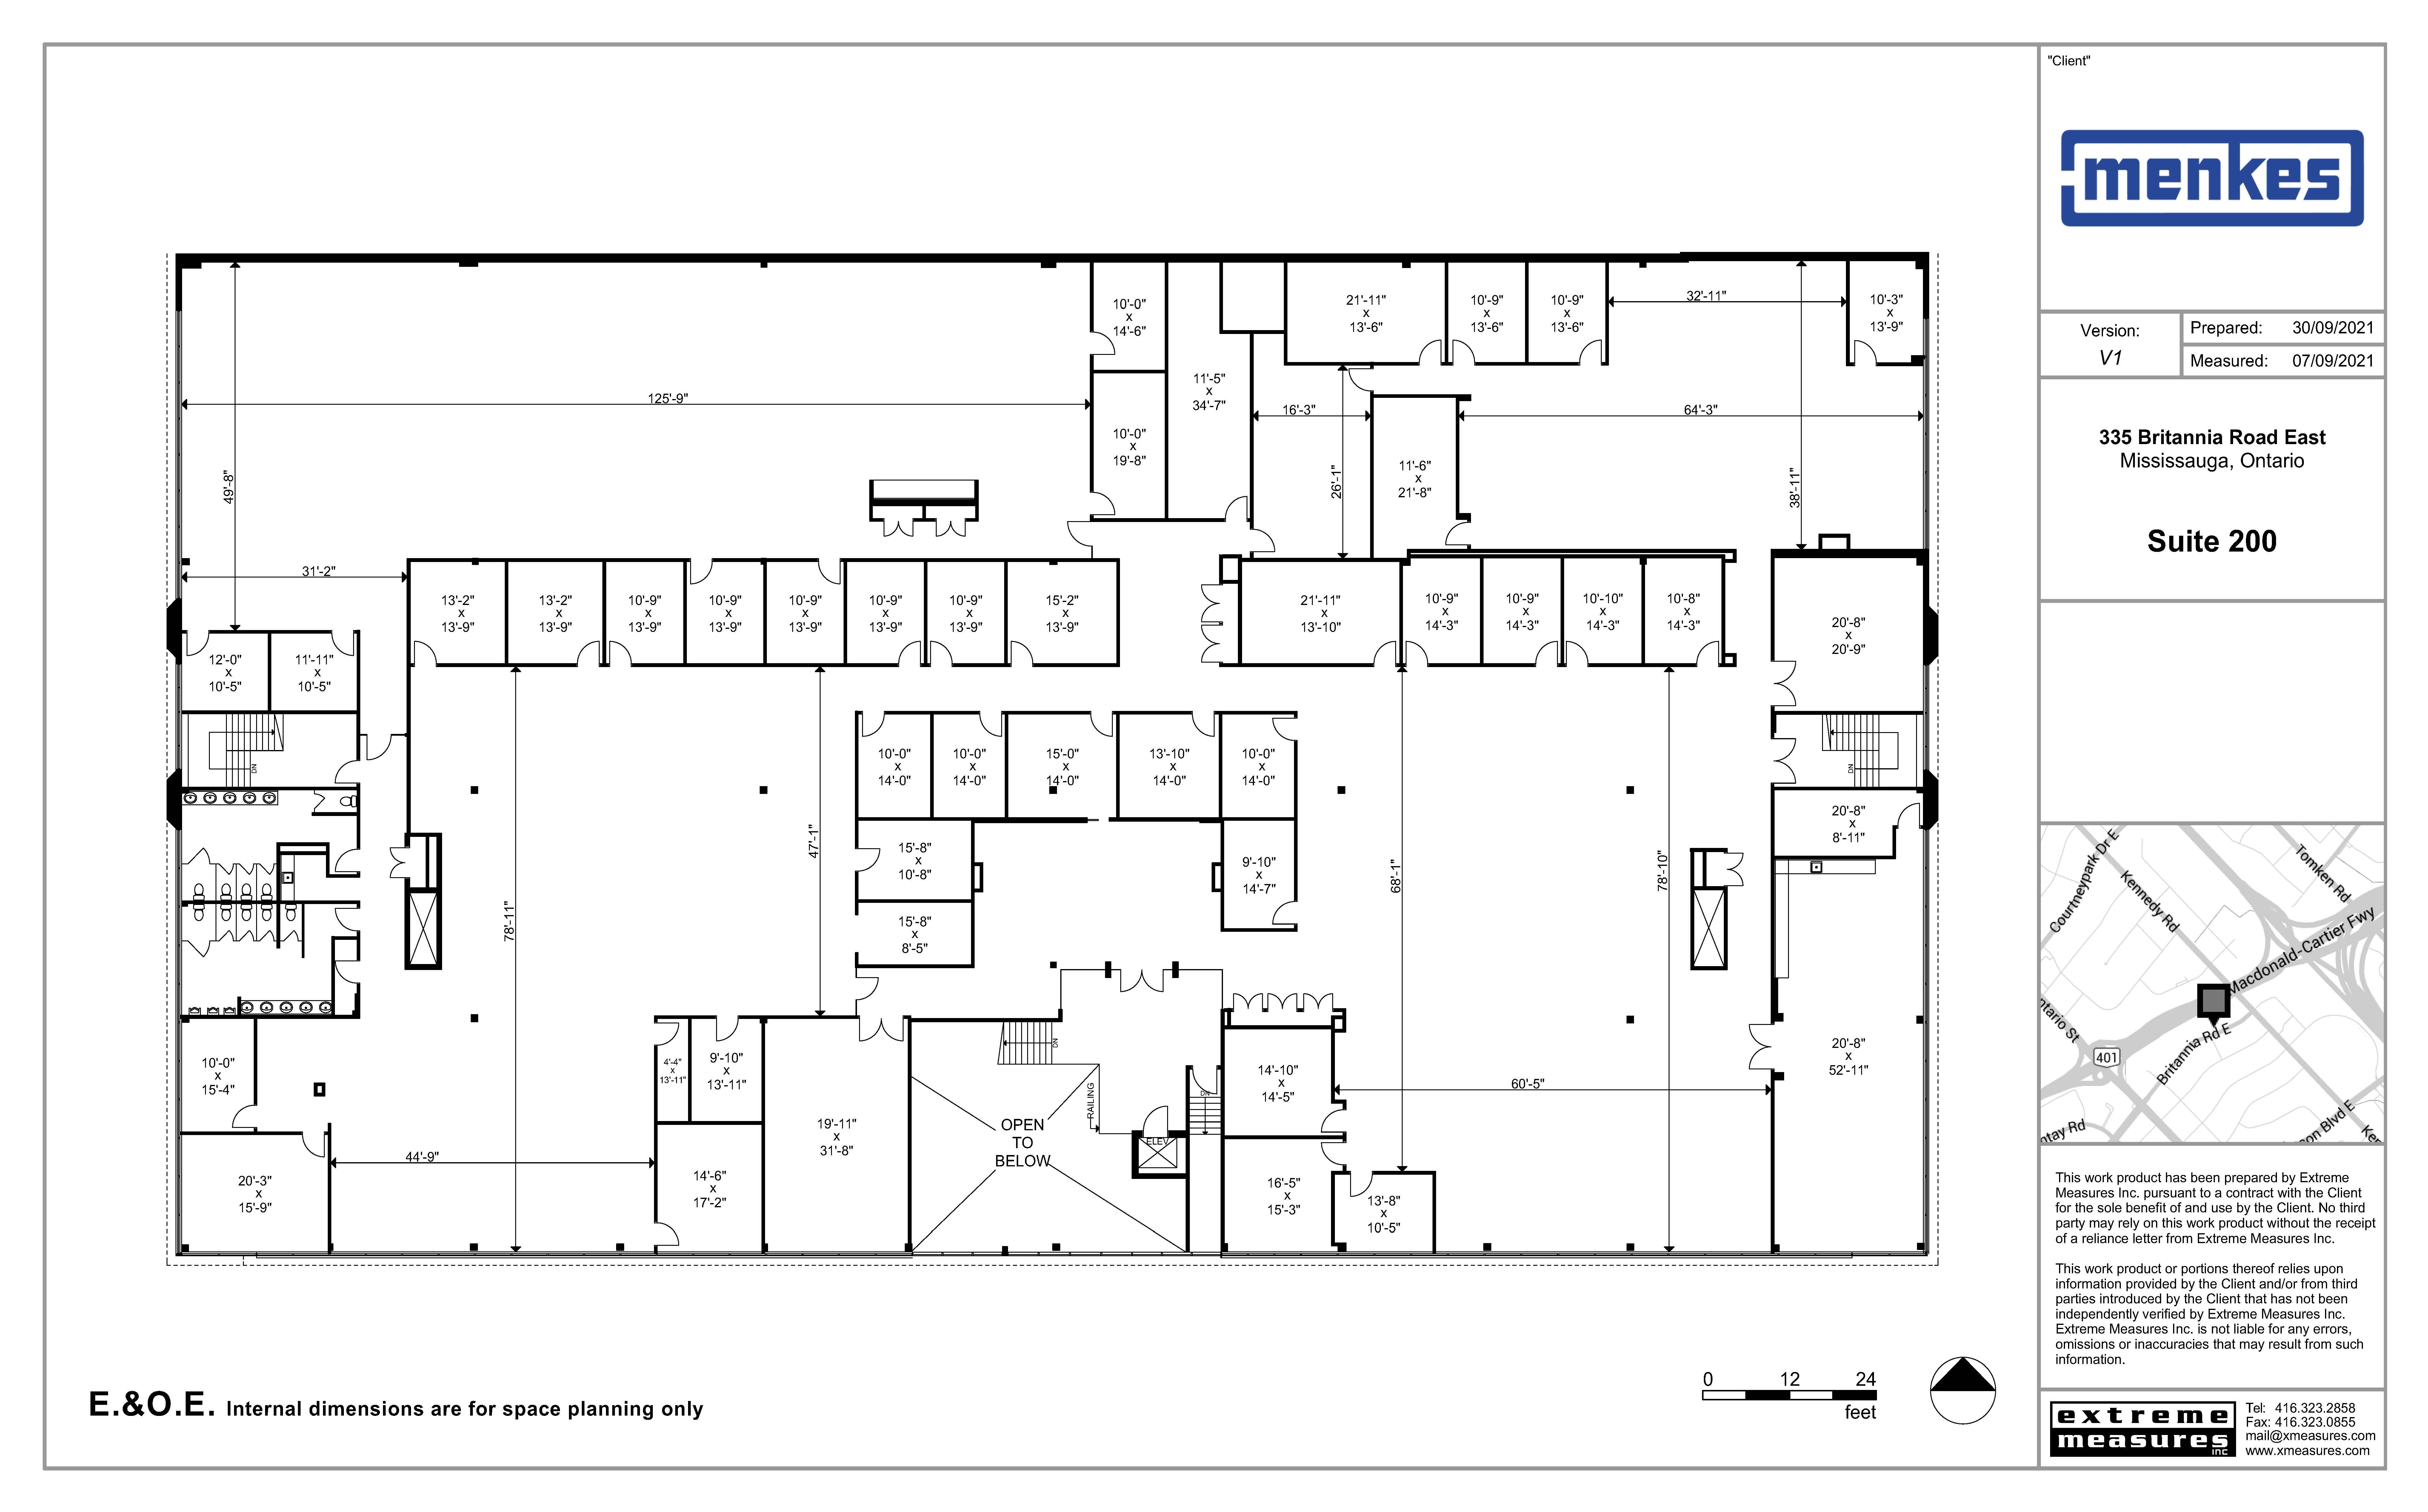 Floorplan thumbnail of Suite 200